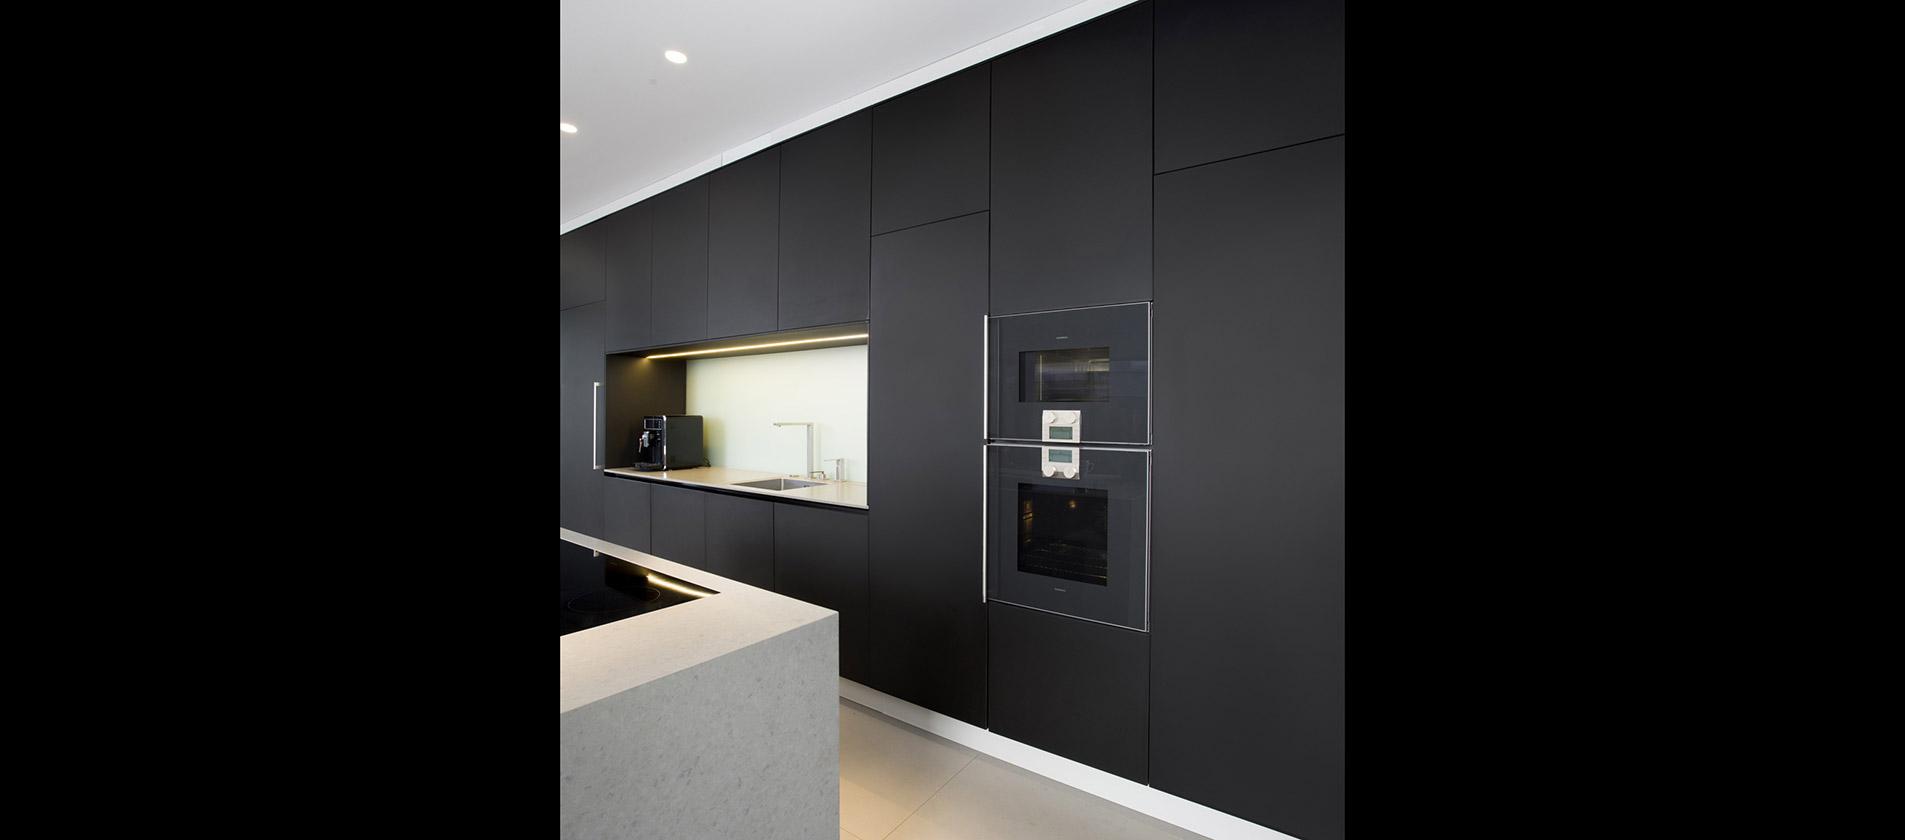 mtb k che mit perfektem styling in antrazit. Black Bedroom Furniture Sets. Home Design Ideas